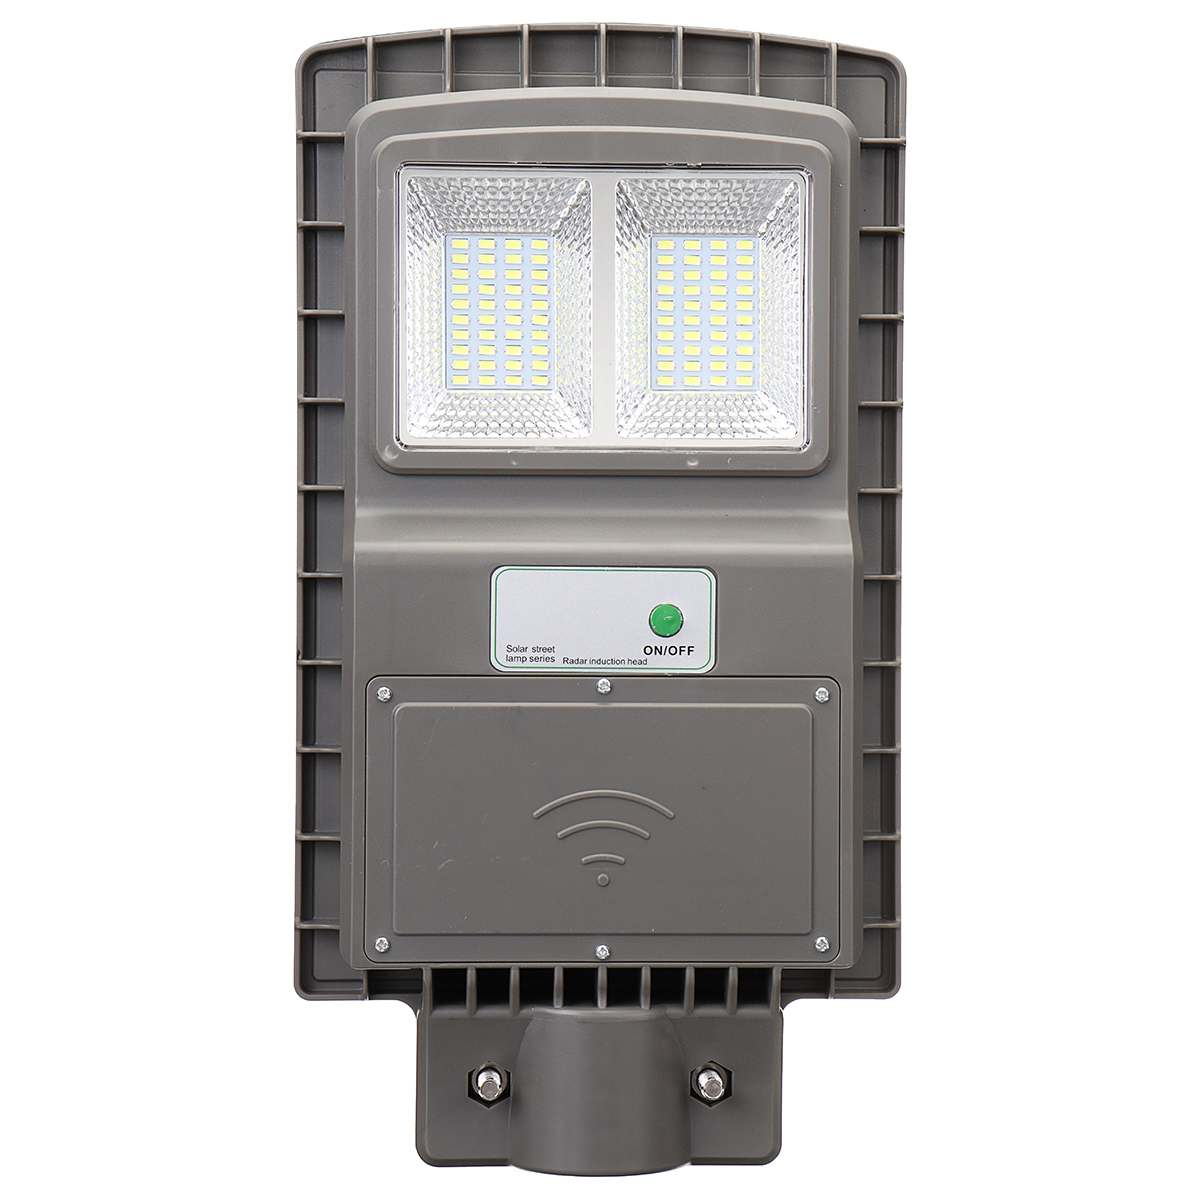 30W Solar Street Light Powered LED Outdoor Lighting PIR Motion Sensor Garden Wall Street Lamp Gray Shell Waterproof for Plaza